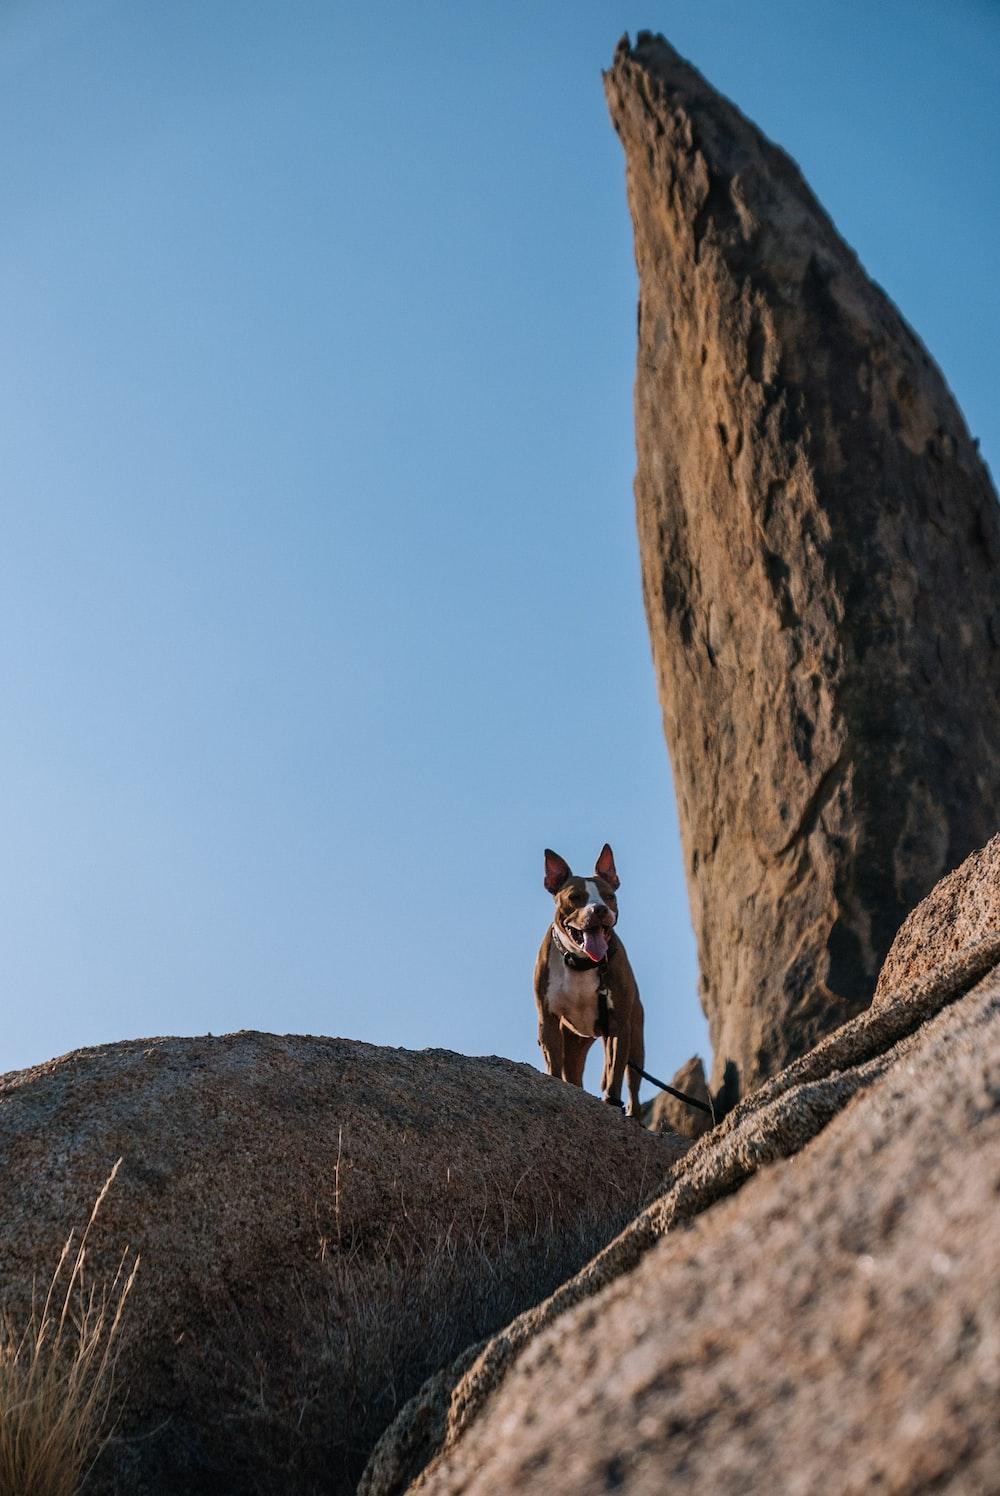 short-coated grey dog standing on rock